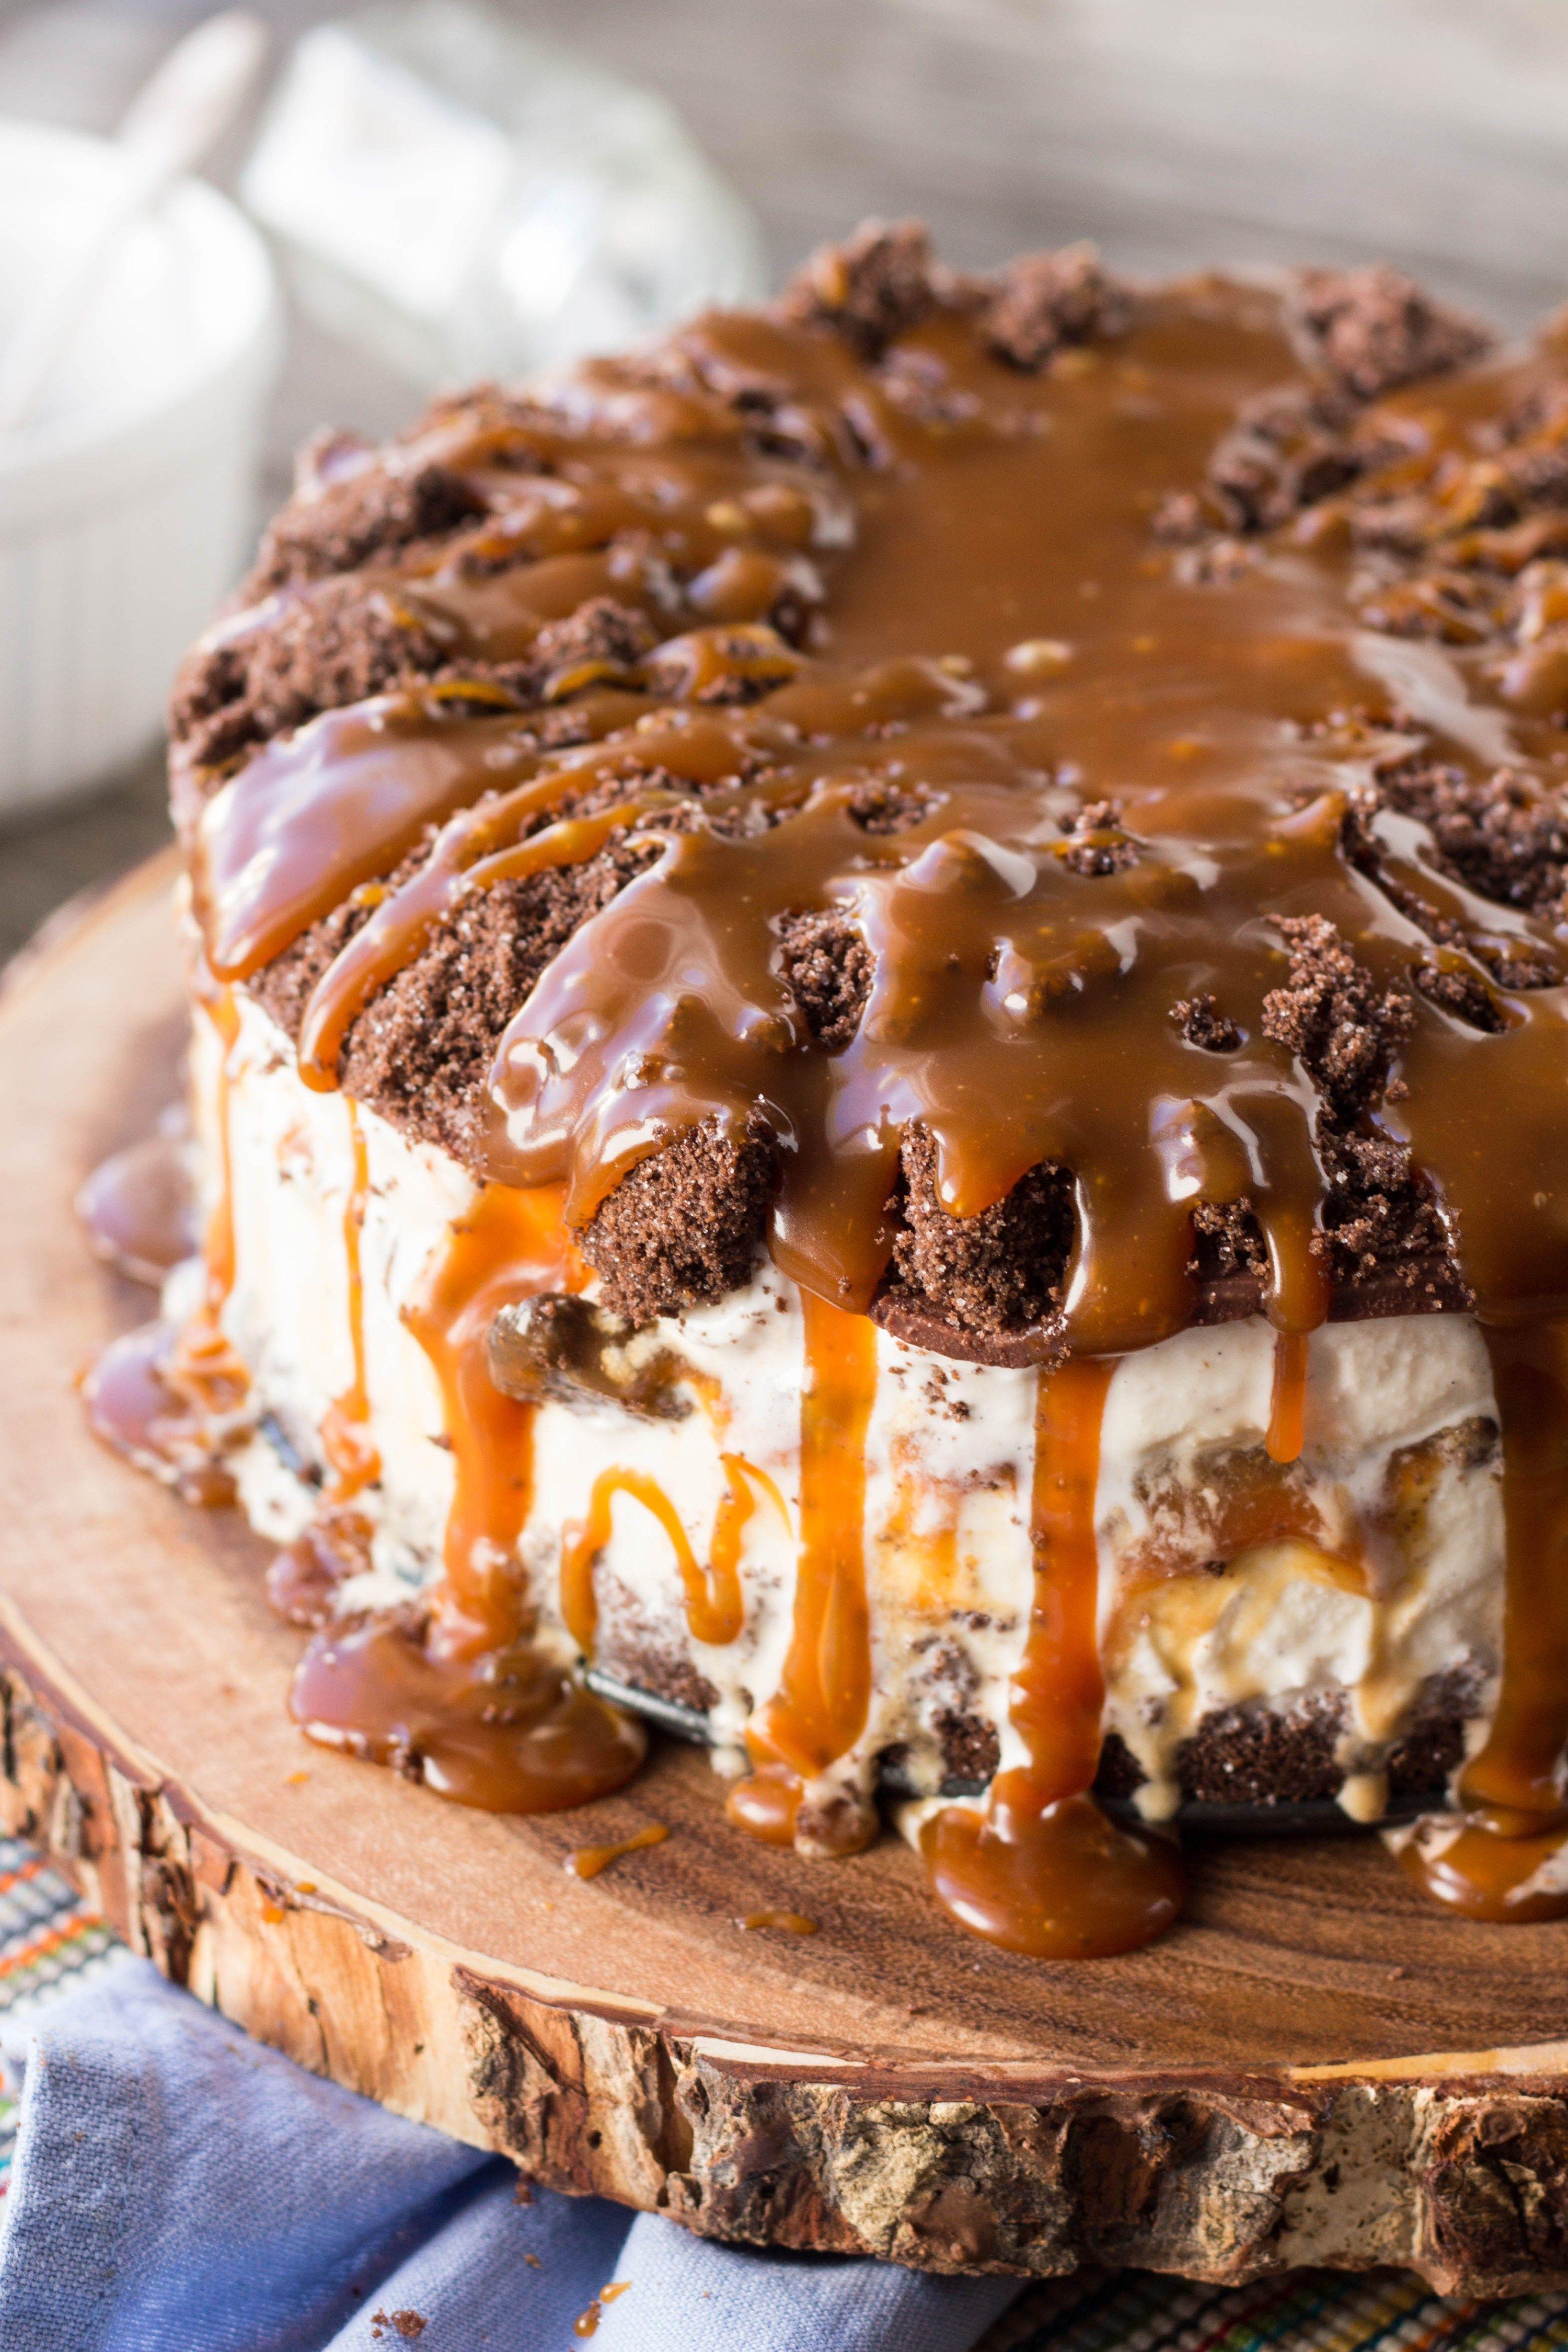 Salted Chocolate + Caramel Ice Cream Cake Recipe Ice